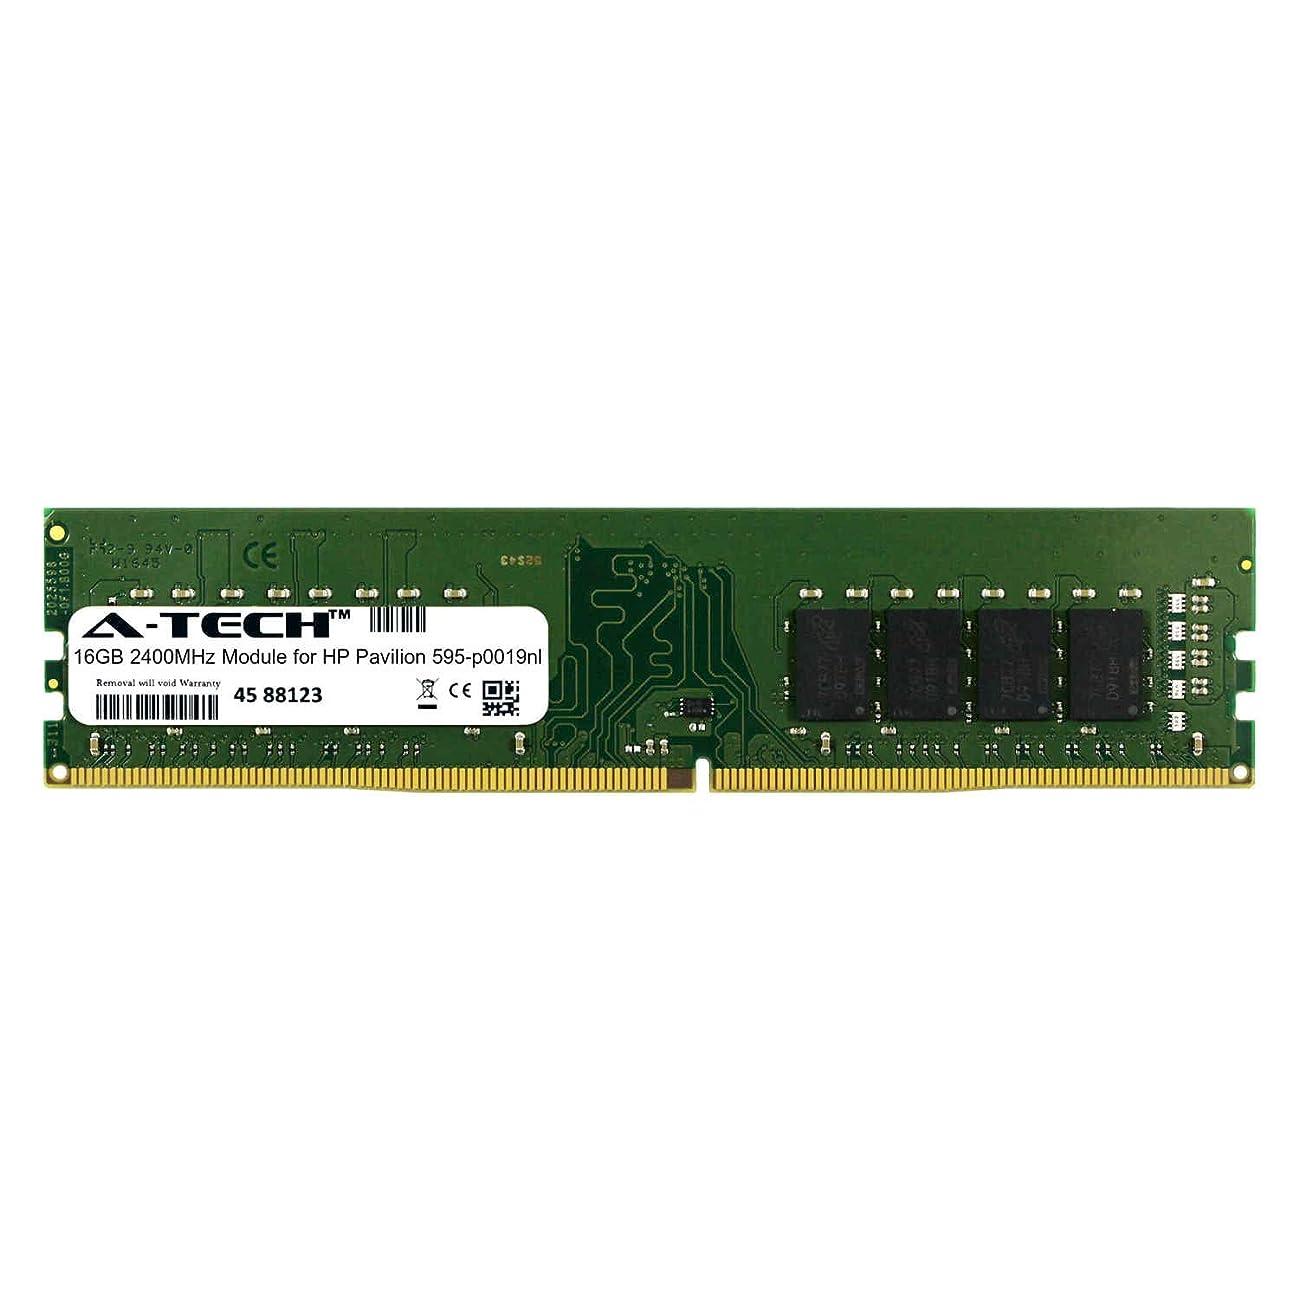 A-Tech 16GB Module for HP Pavilion 595-p0019nl Desktop & Workstation Motherboard Compatible DDR4 2400Mhz Memory Ram (ATMS311508A25822X1)